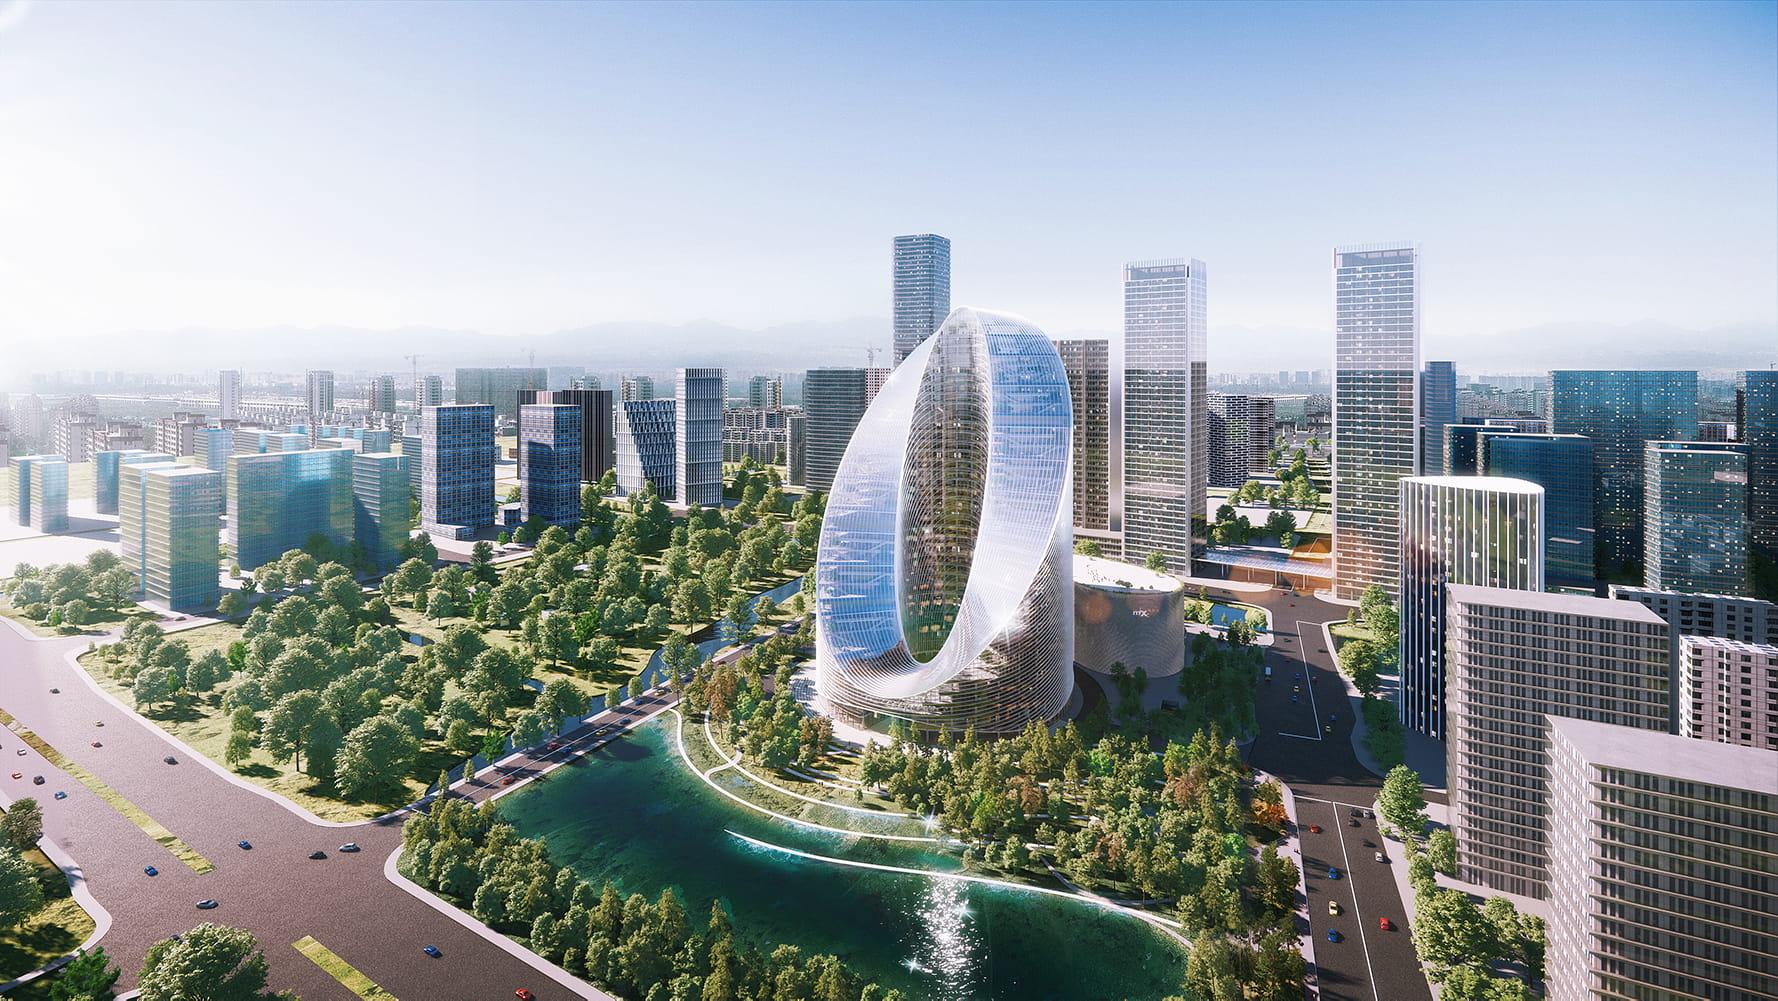 BIG OPPO O Tower Hangzhou China